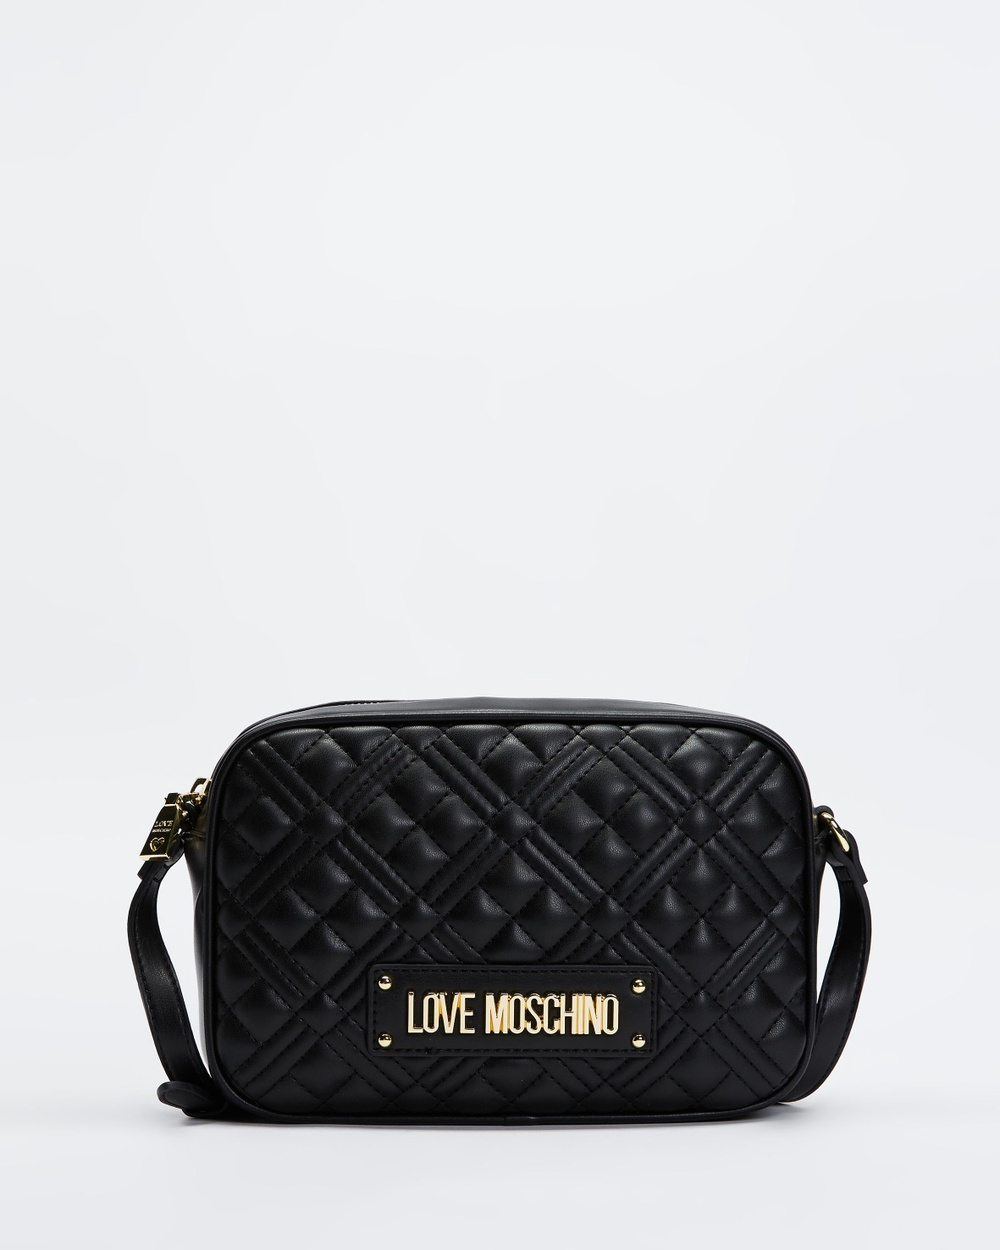 LOVE MOSCHINO Quilted Soft PU Crossbody Bag Handbags Nero